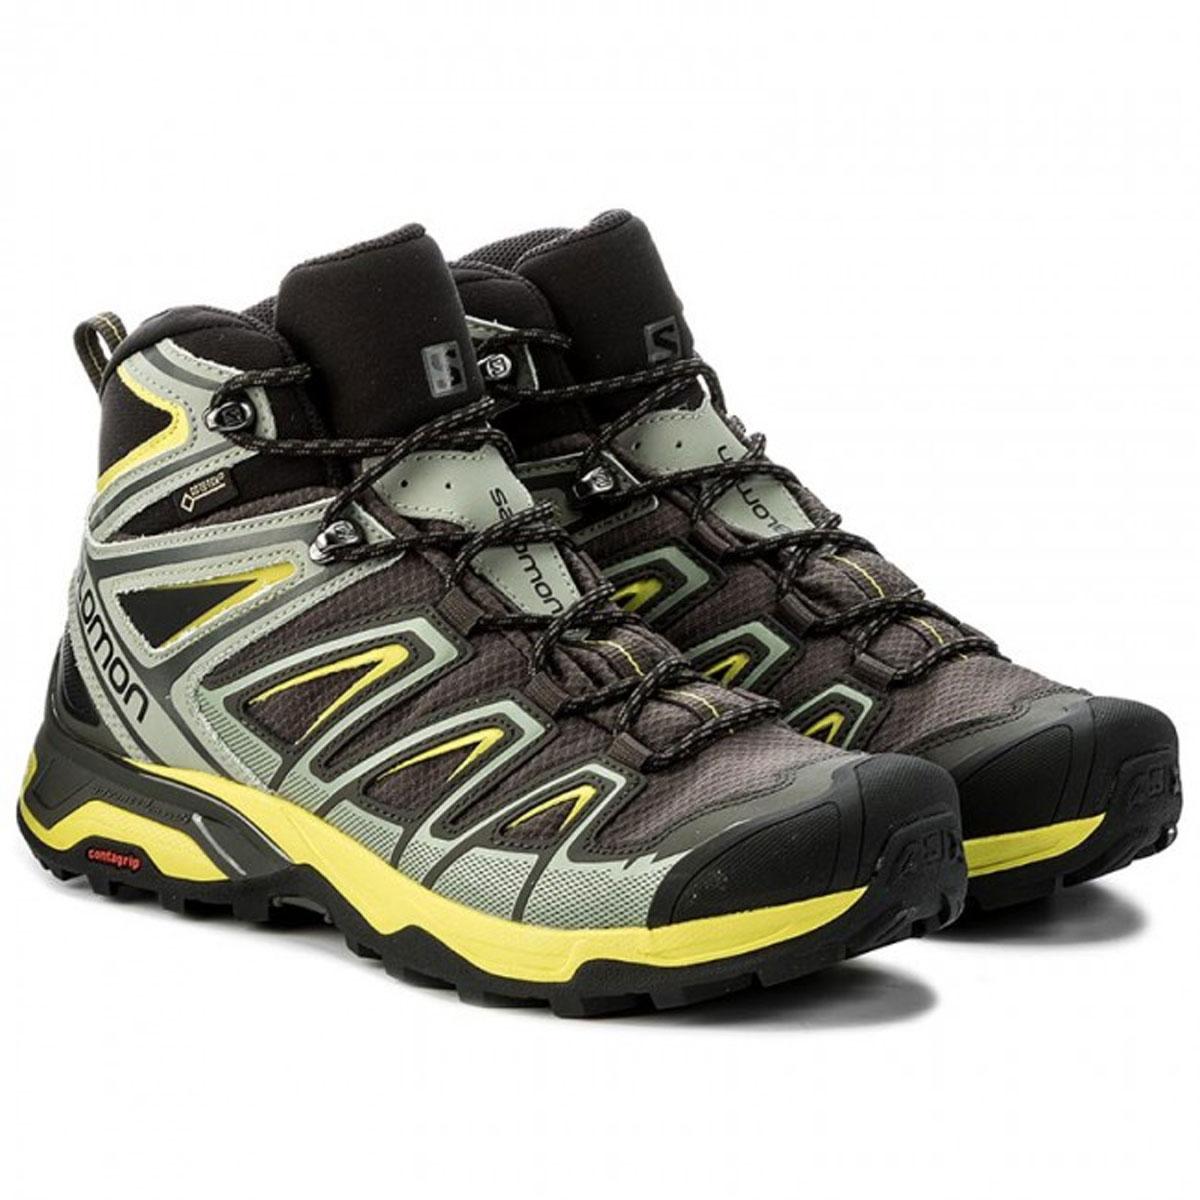 huge selection of 9100d adfc5 Salomon X Ultra Mid 3 GTX Walking Boots (Men's) - Beluga/Shadow/Sulphur  Spring